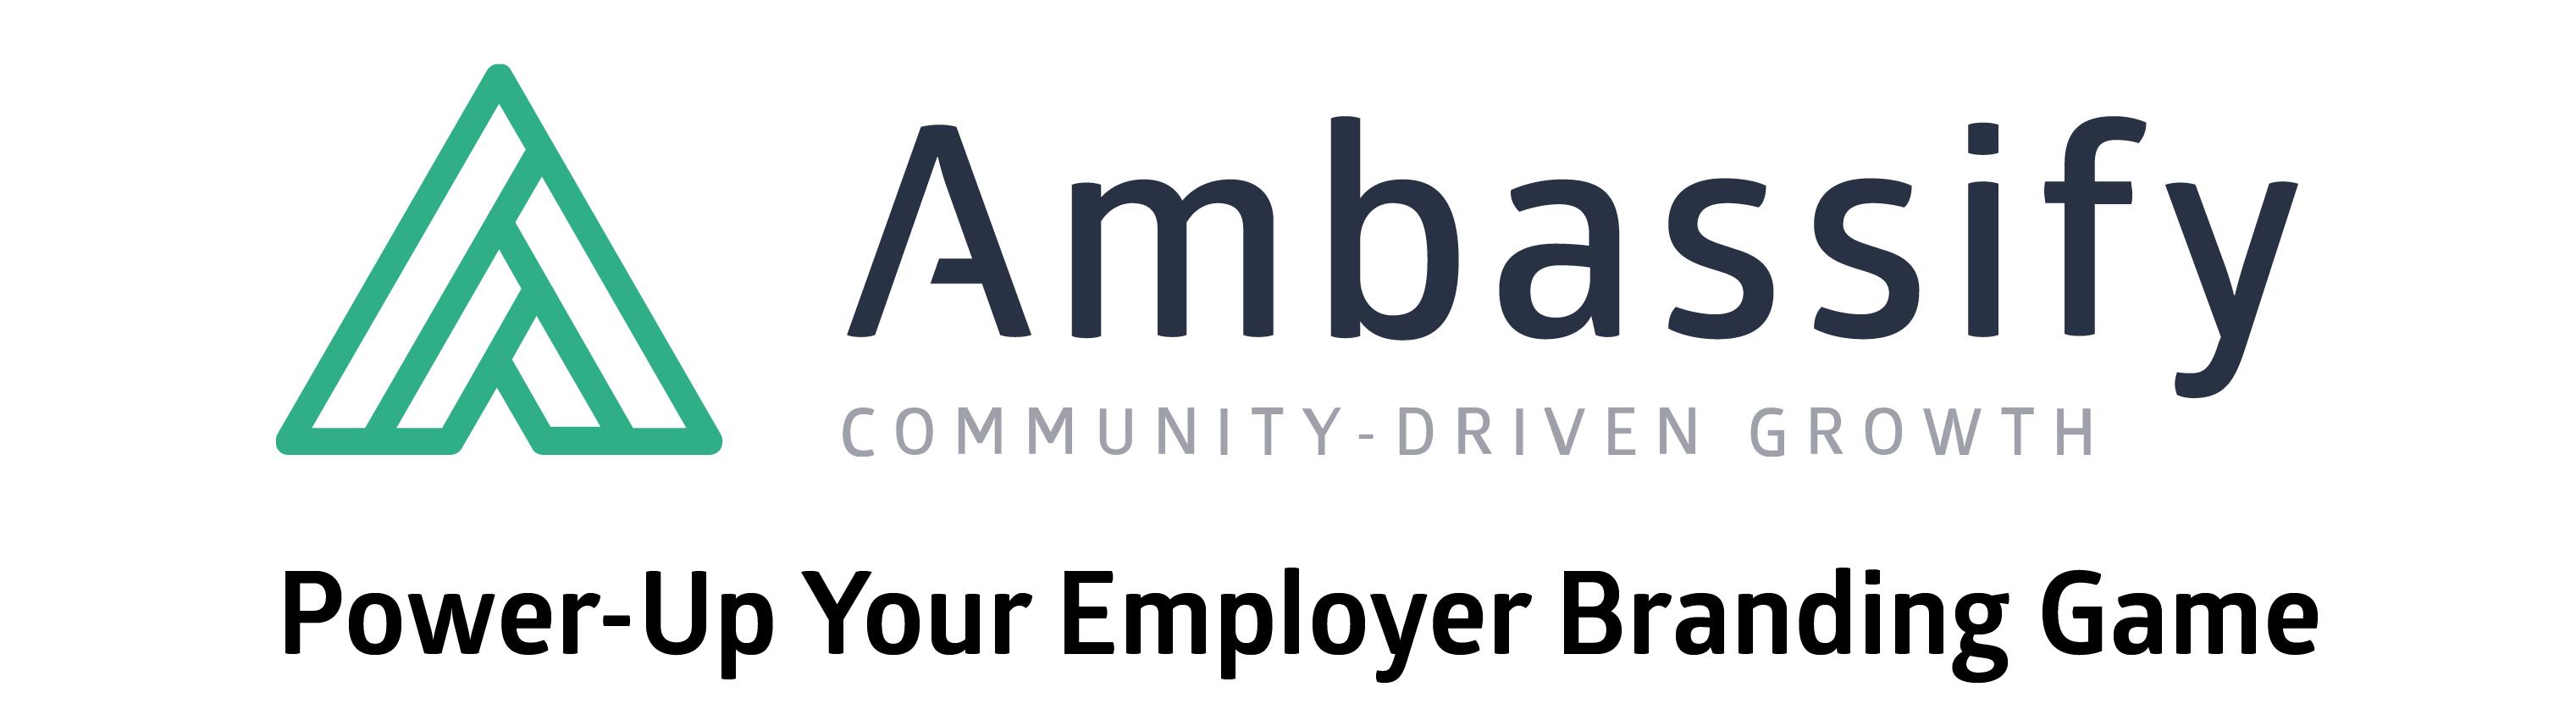 Ambassify logo_Tekengebied 1